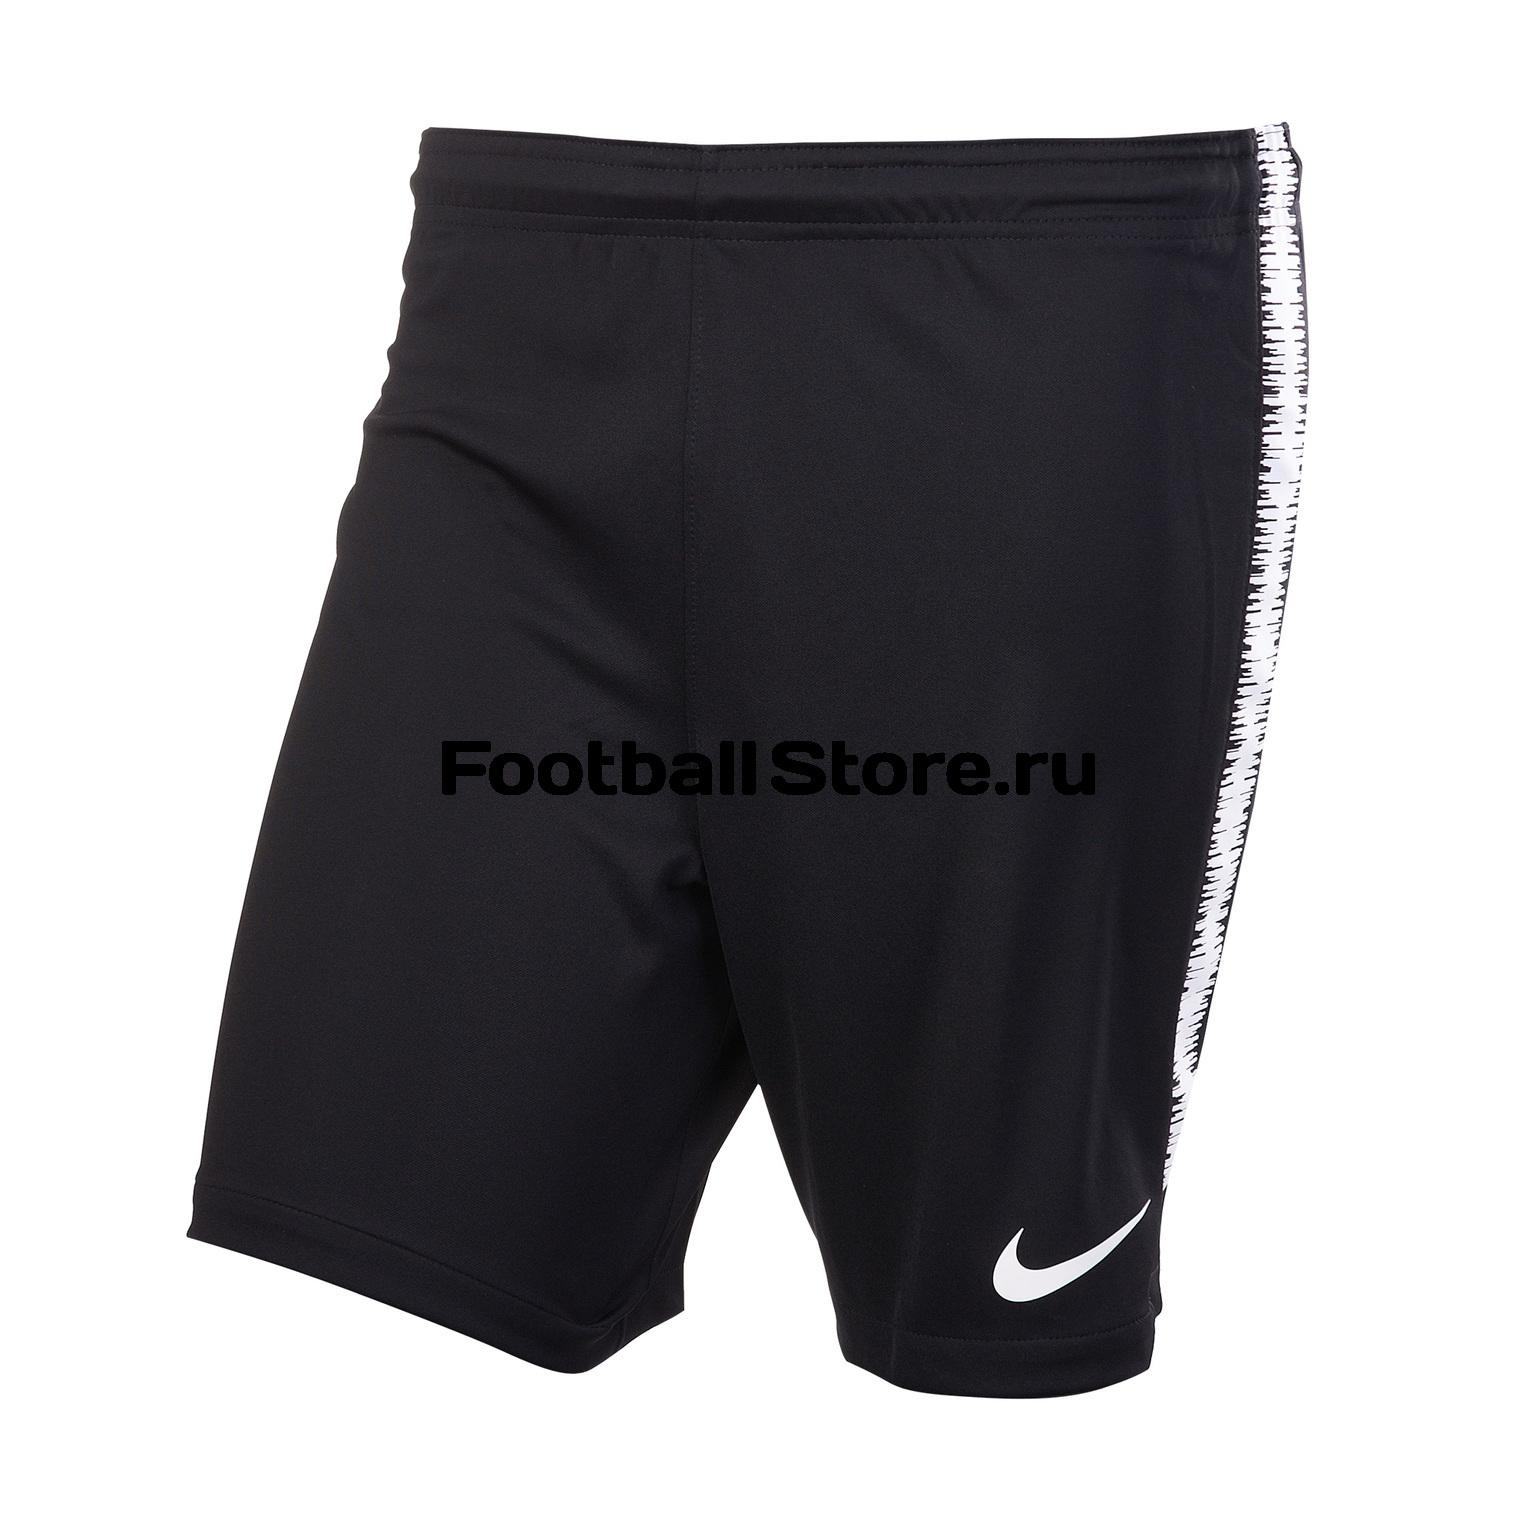 Шорты тренировочные Nike Dry SQD Short 18 894545-012 шорты nike шорты игровые nike m nk sqd short k 807670 852 page 2